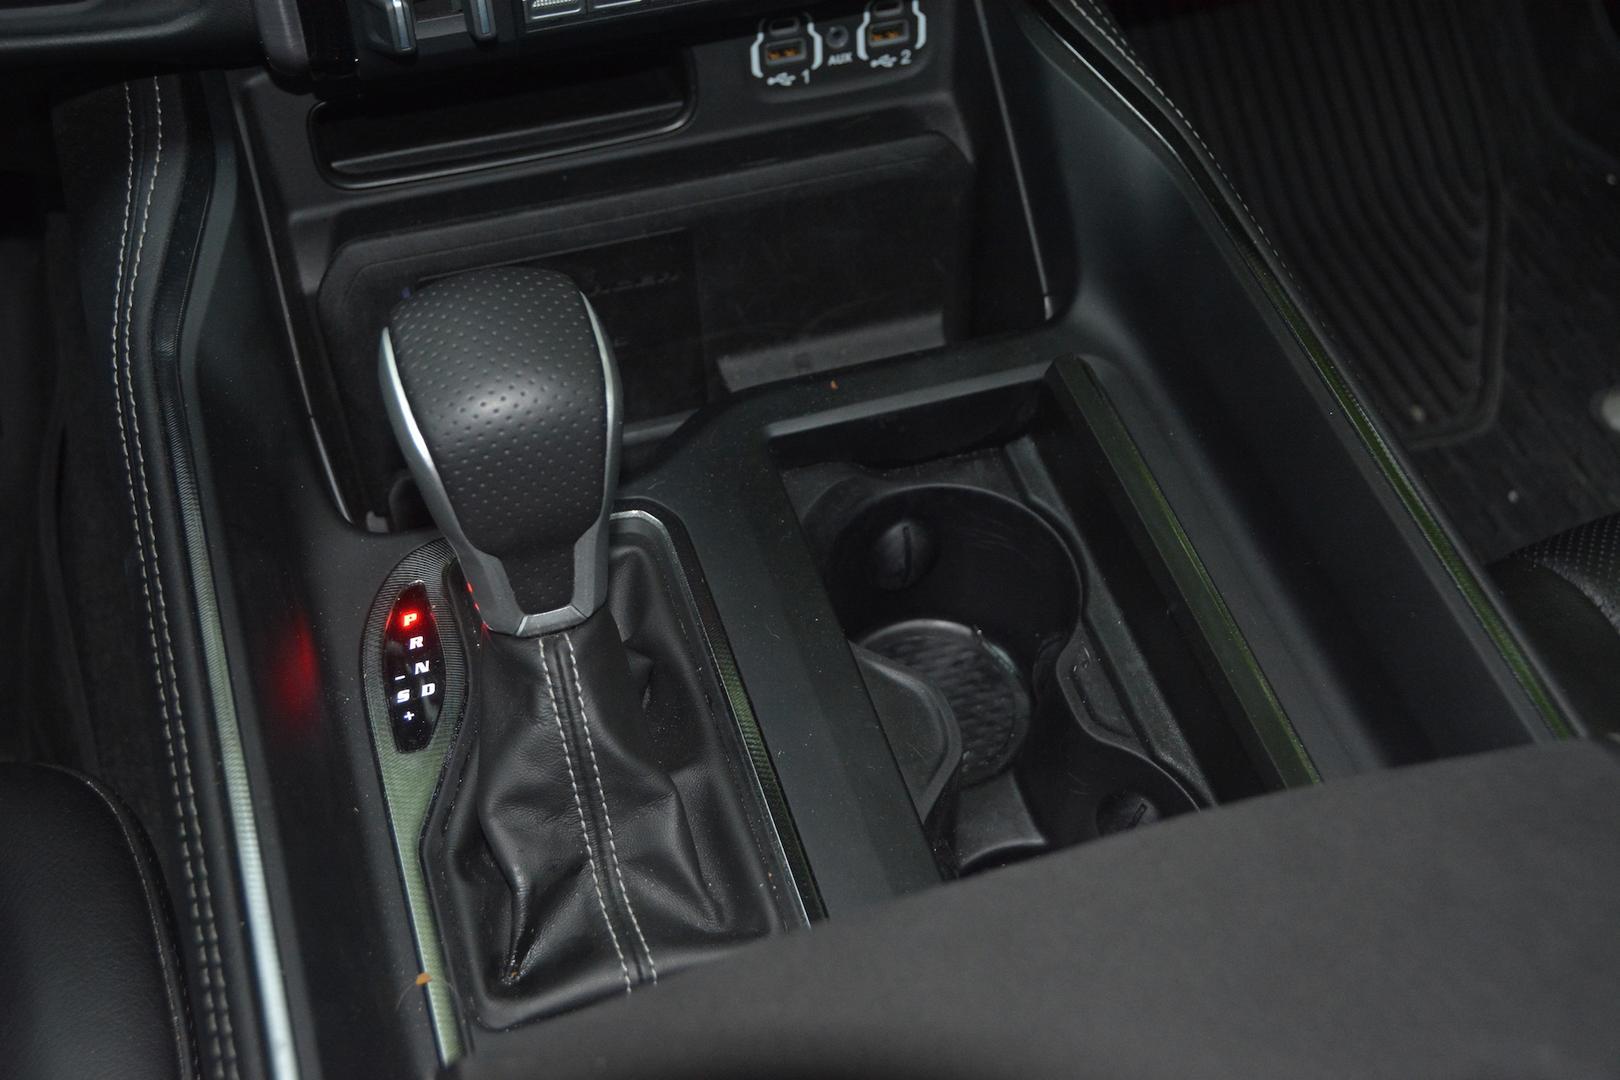 2021 Ram 1500 TRX gear shifter